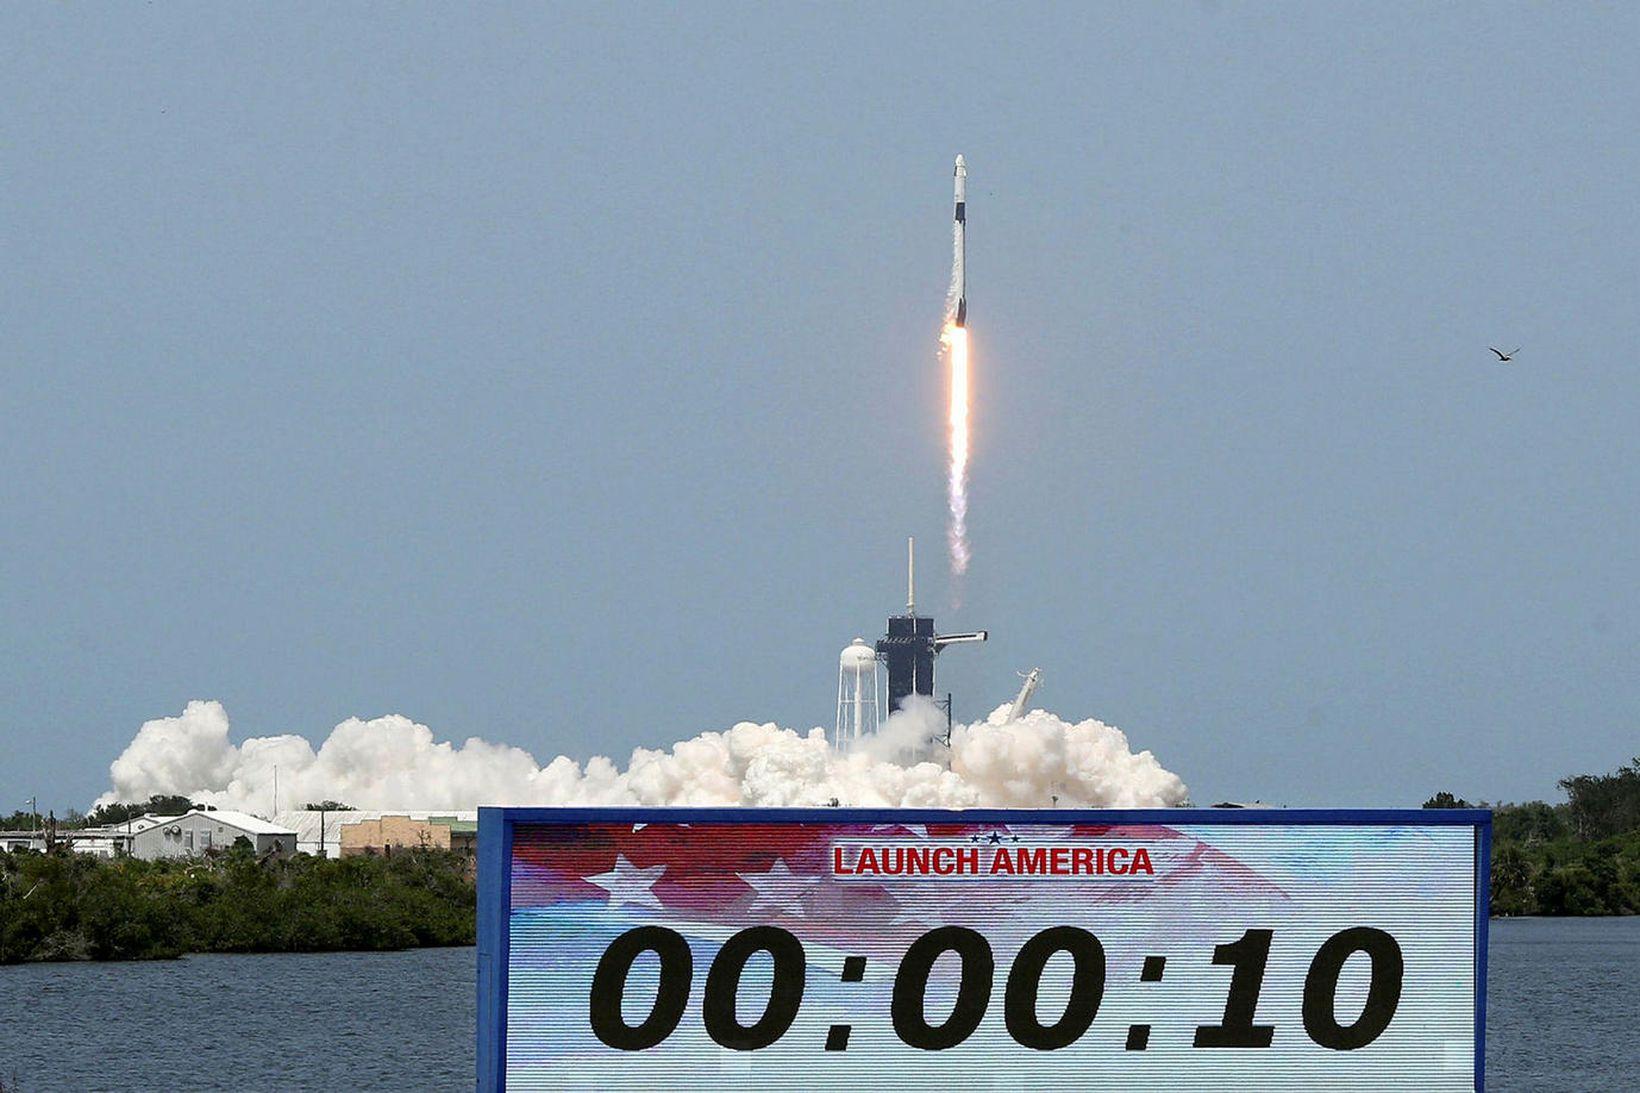 Falcon 9 eldflaug SpaceX sést hér rjúka til himins í …